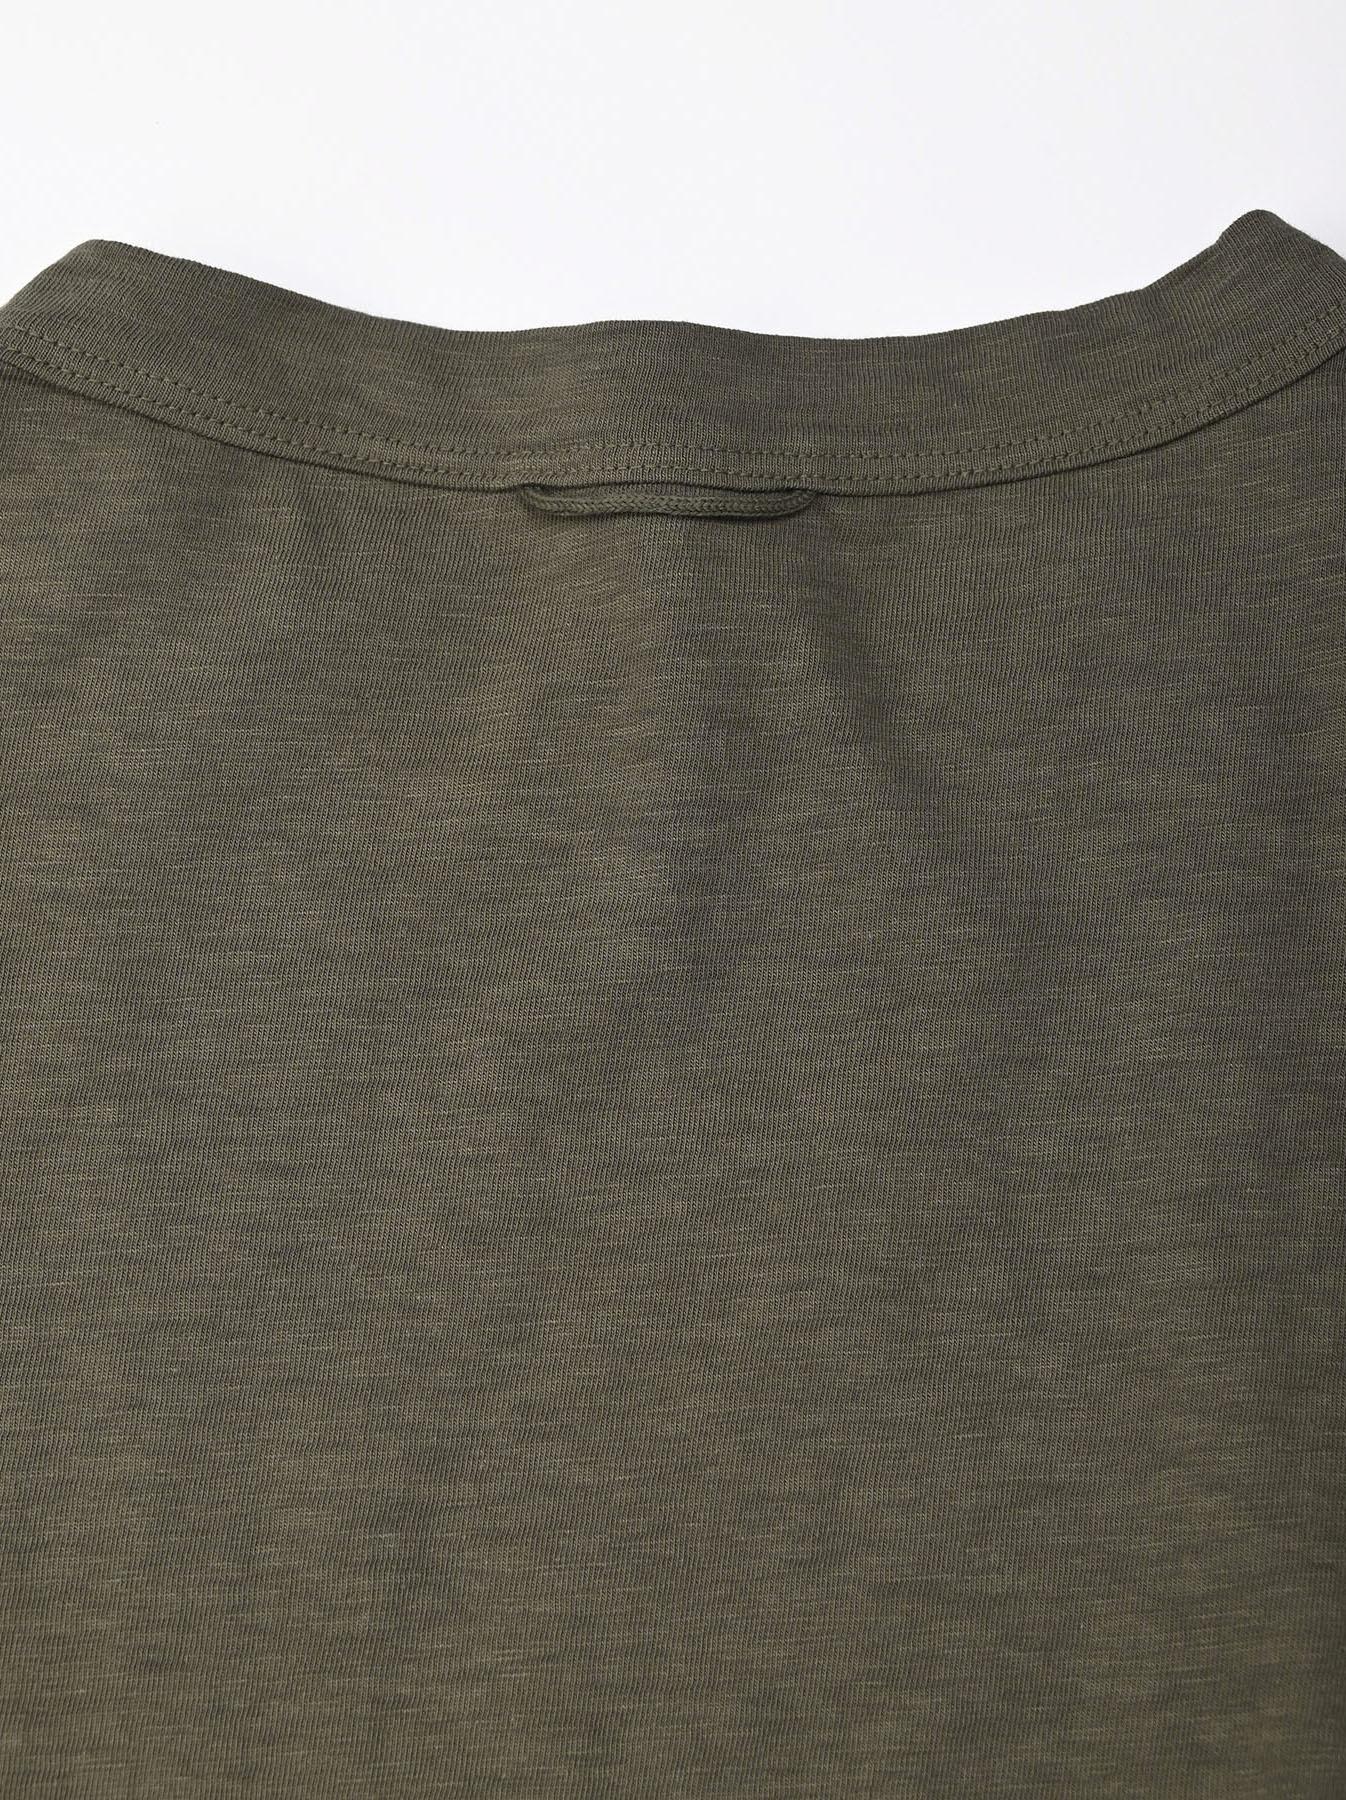 Zimbabwe Cotton Big Slit T-shirt (0721)-7